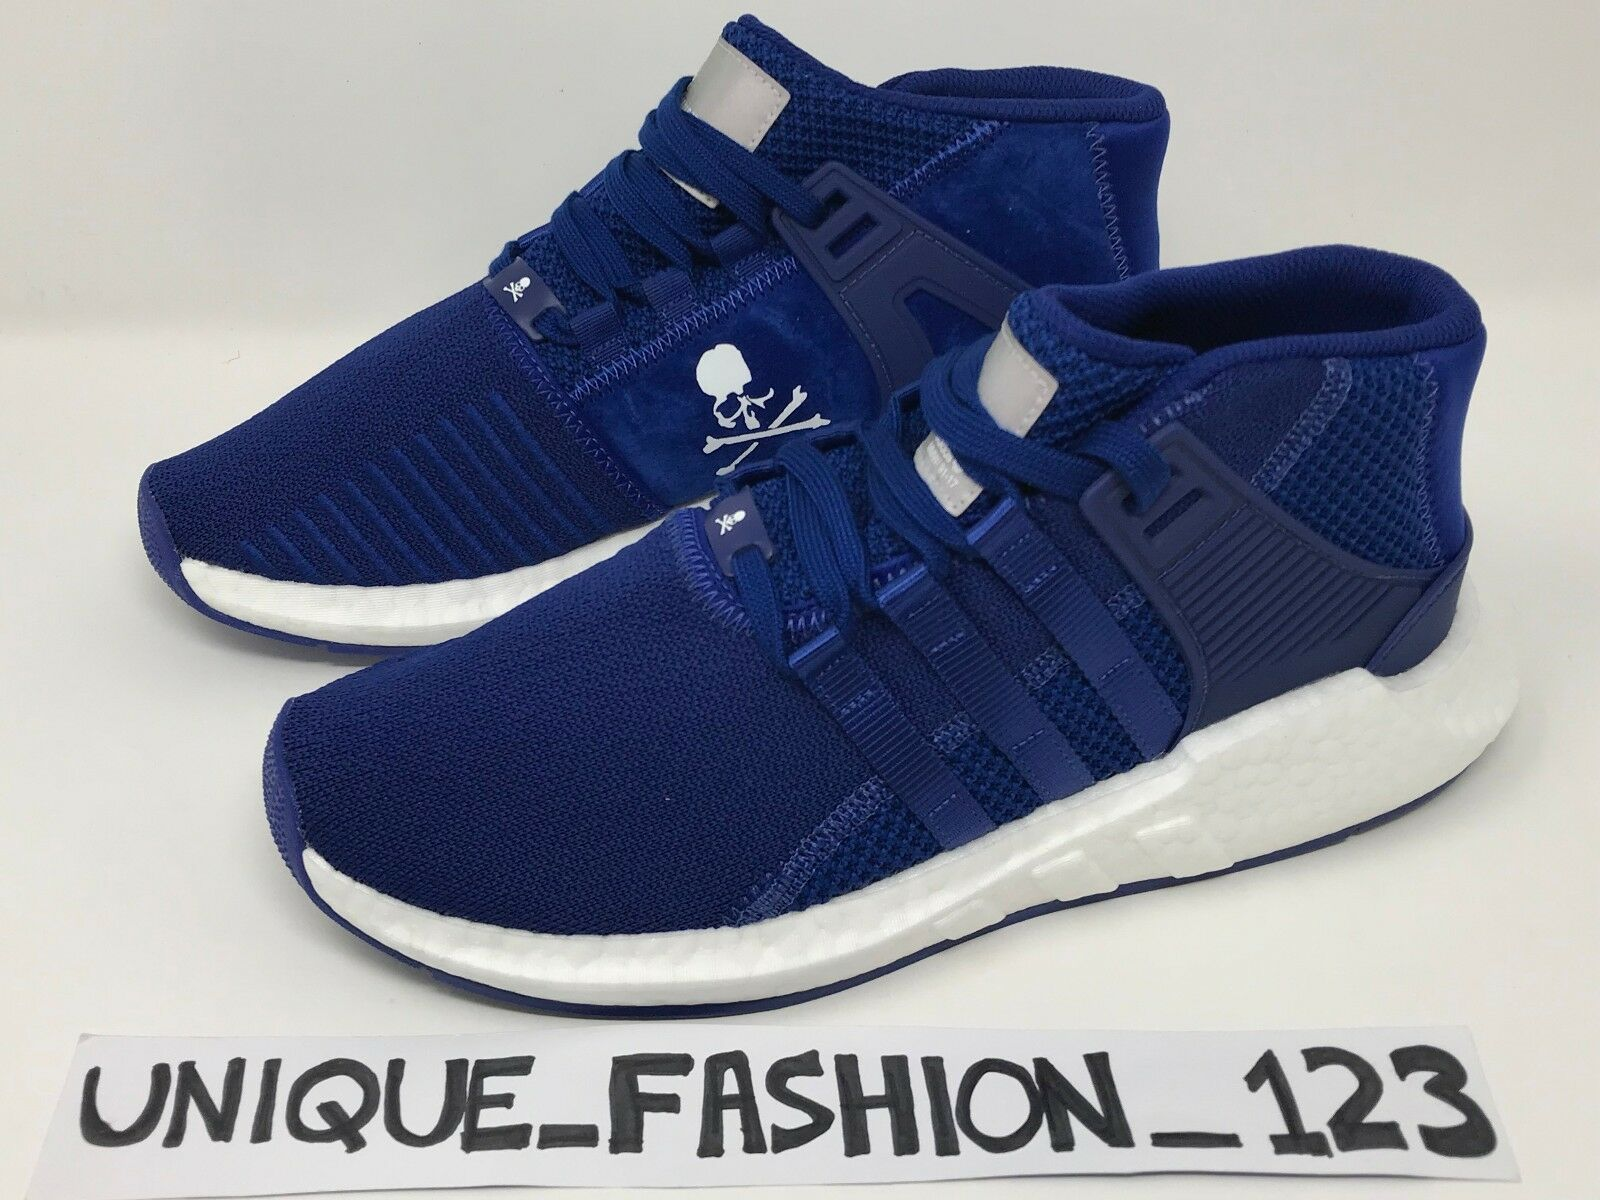 Adidas consorcio EQT Soporte Medio X Mastermind 8 Reino Unido 6 7 8 Mastermind 9 10 11 MMJ Azul MMW f57524